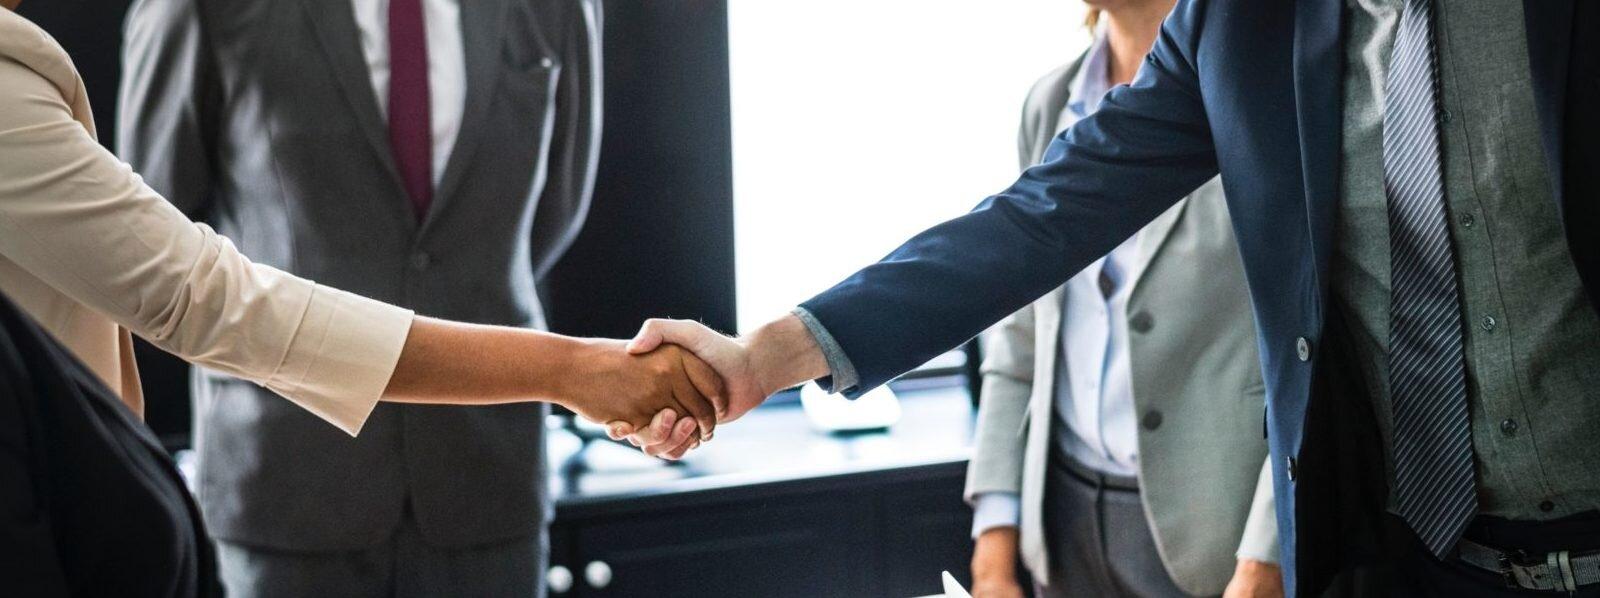 accomplishment-agreement-business-1249158-e1548435613864-1600x598.jpg